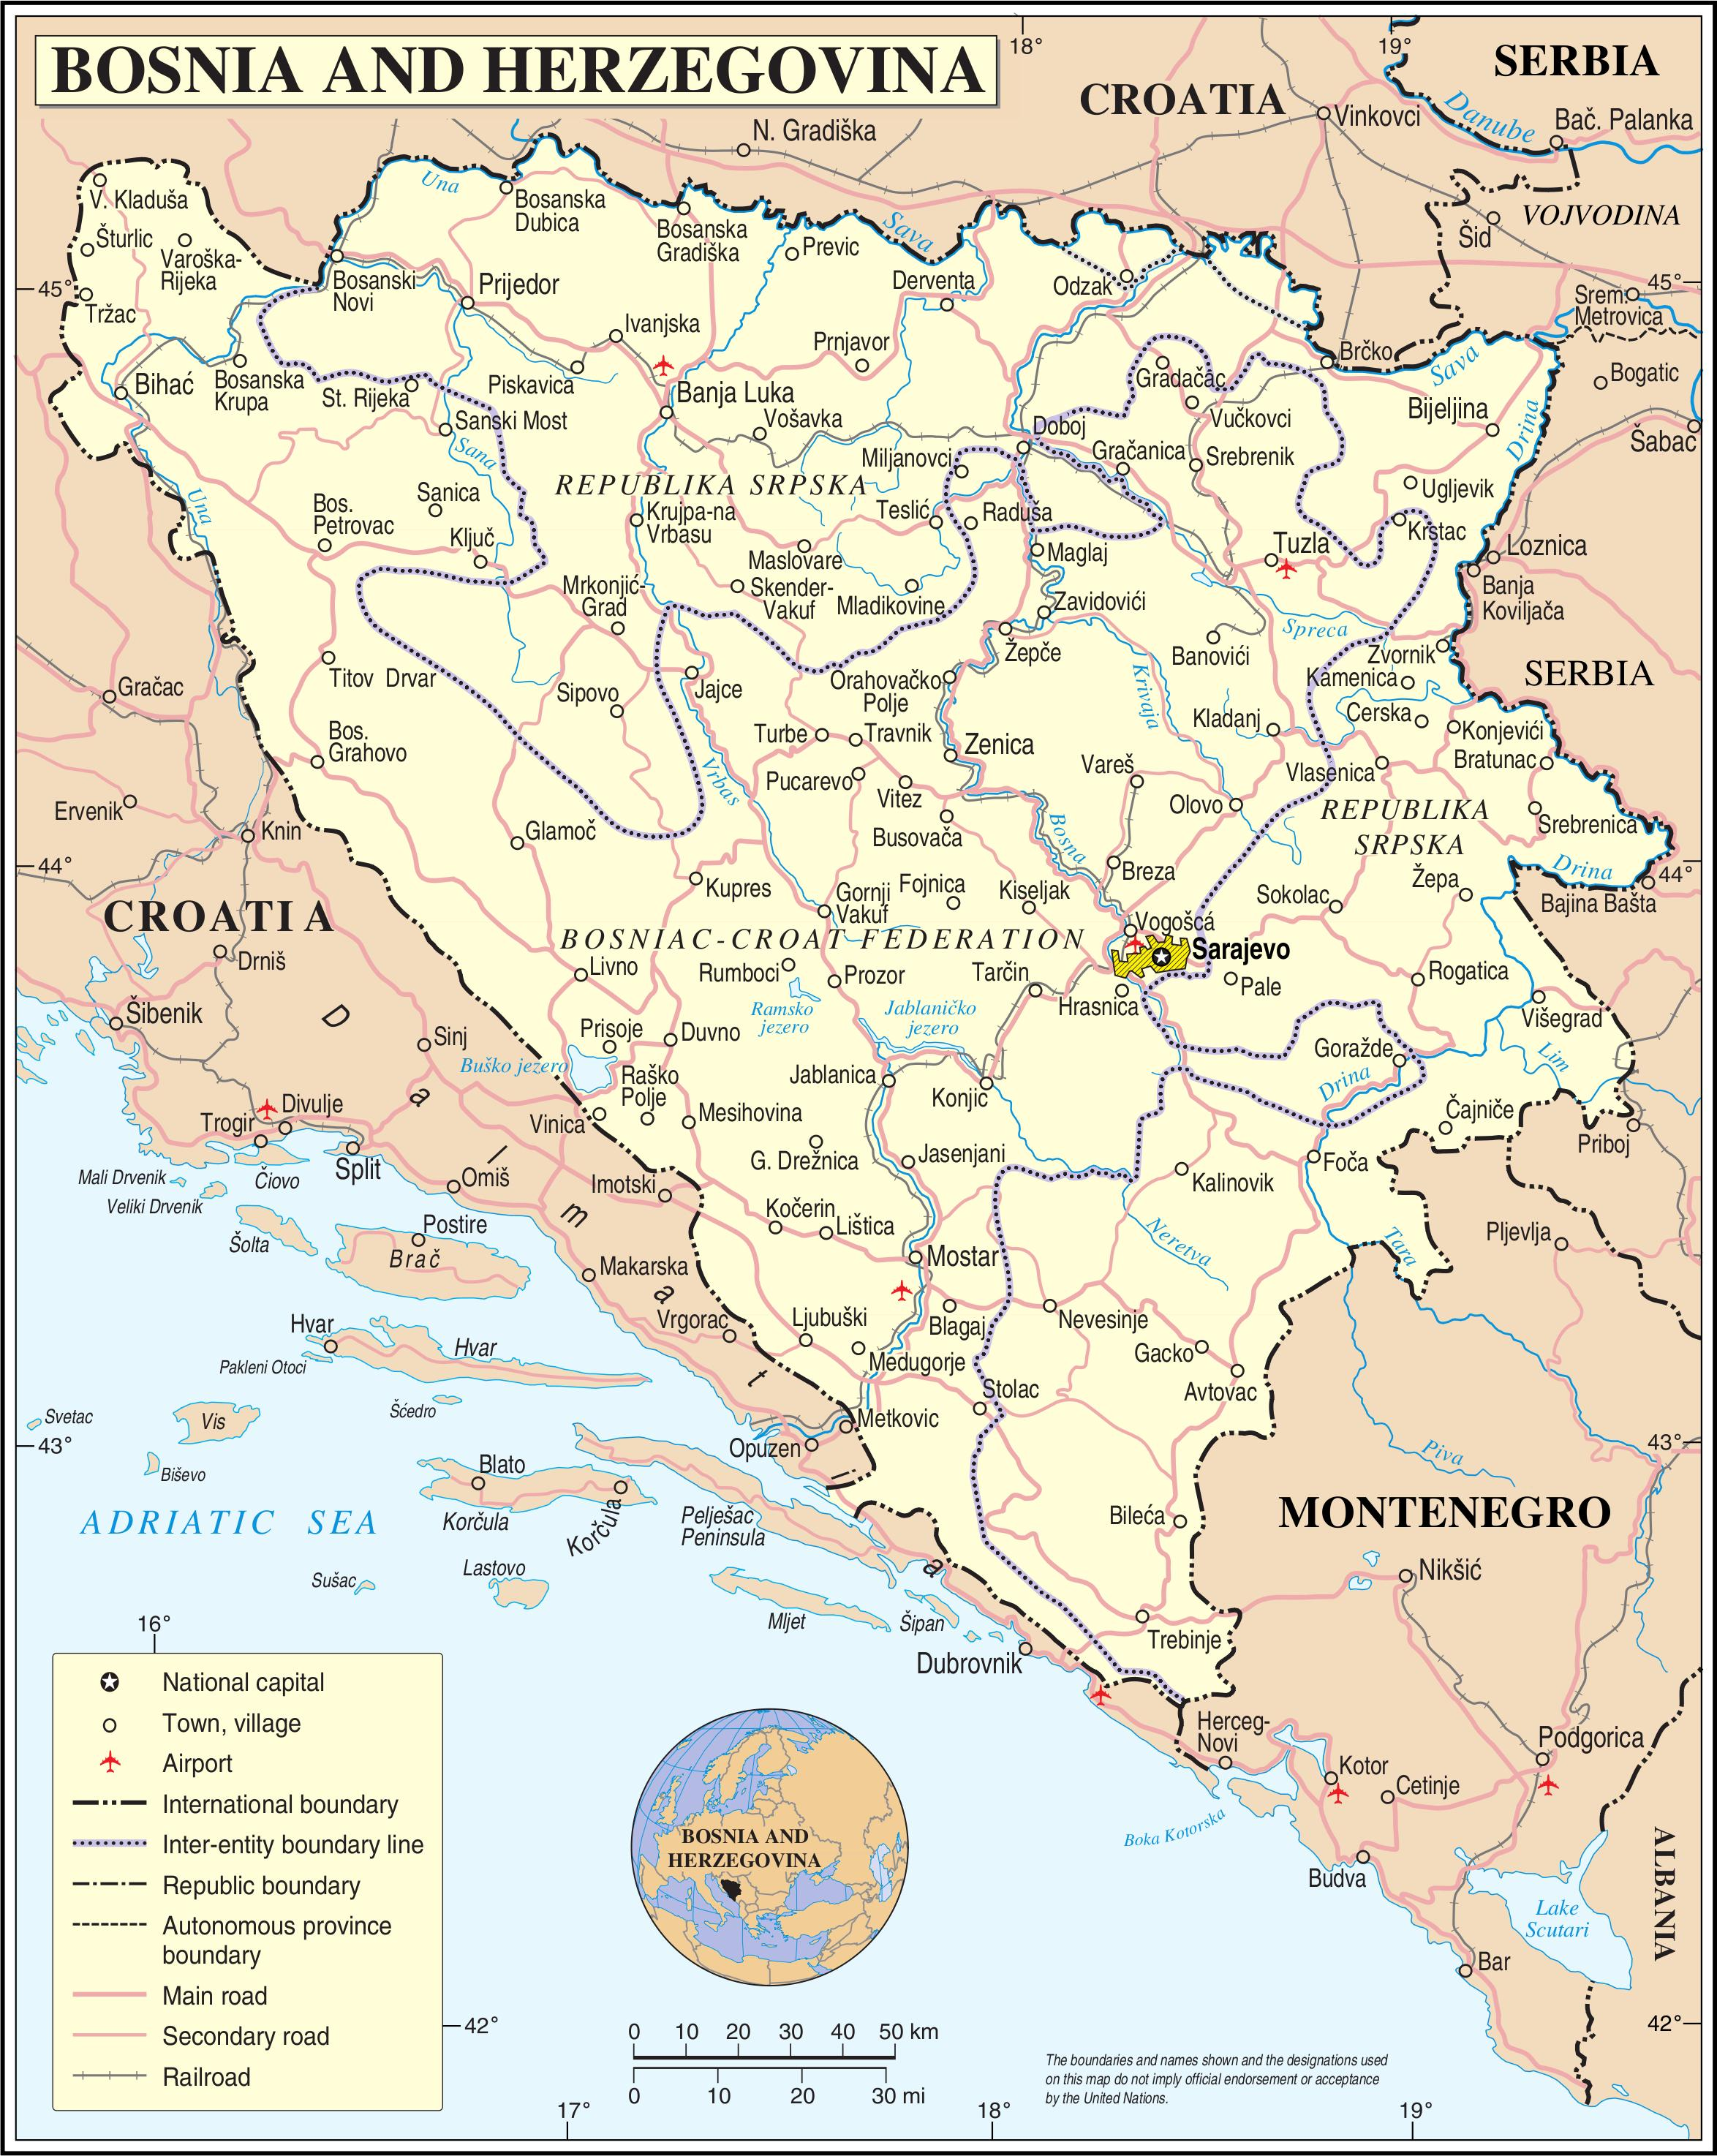 Bosnien Turist Kort Kort Over Bosnien Turist Det Sydlige Europa